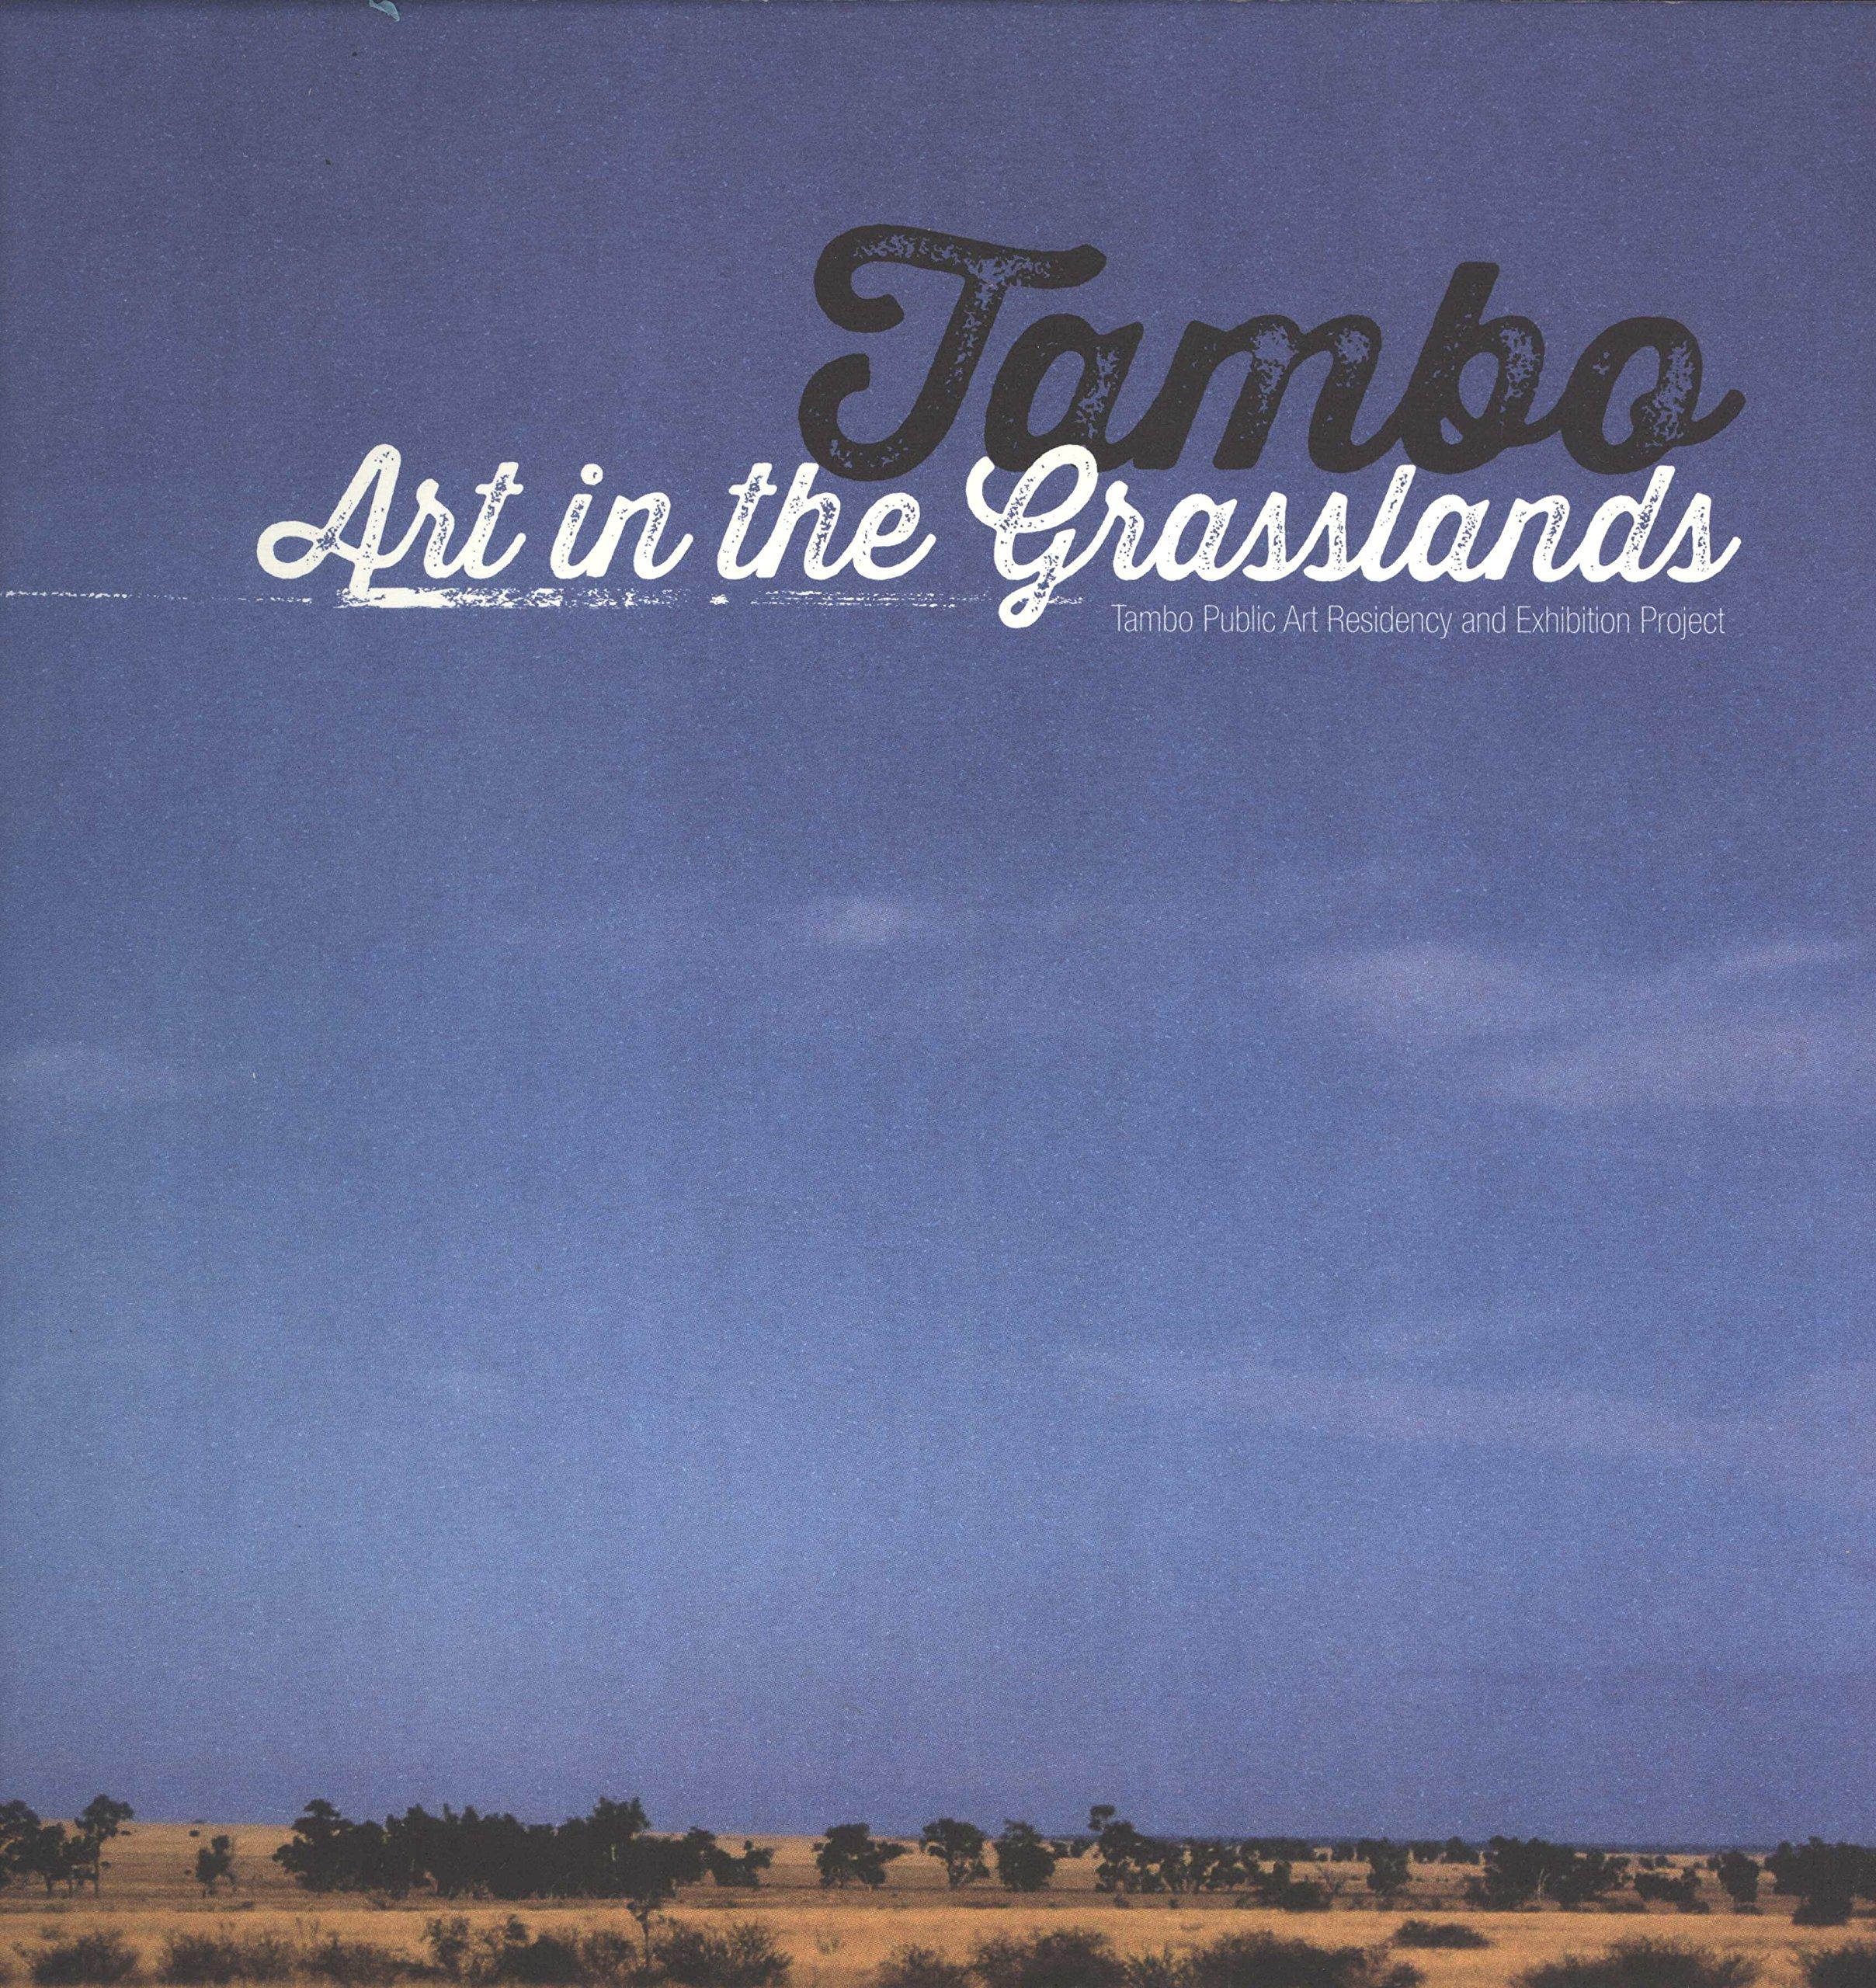 tambo art in the grasslands